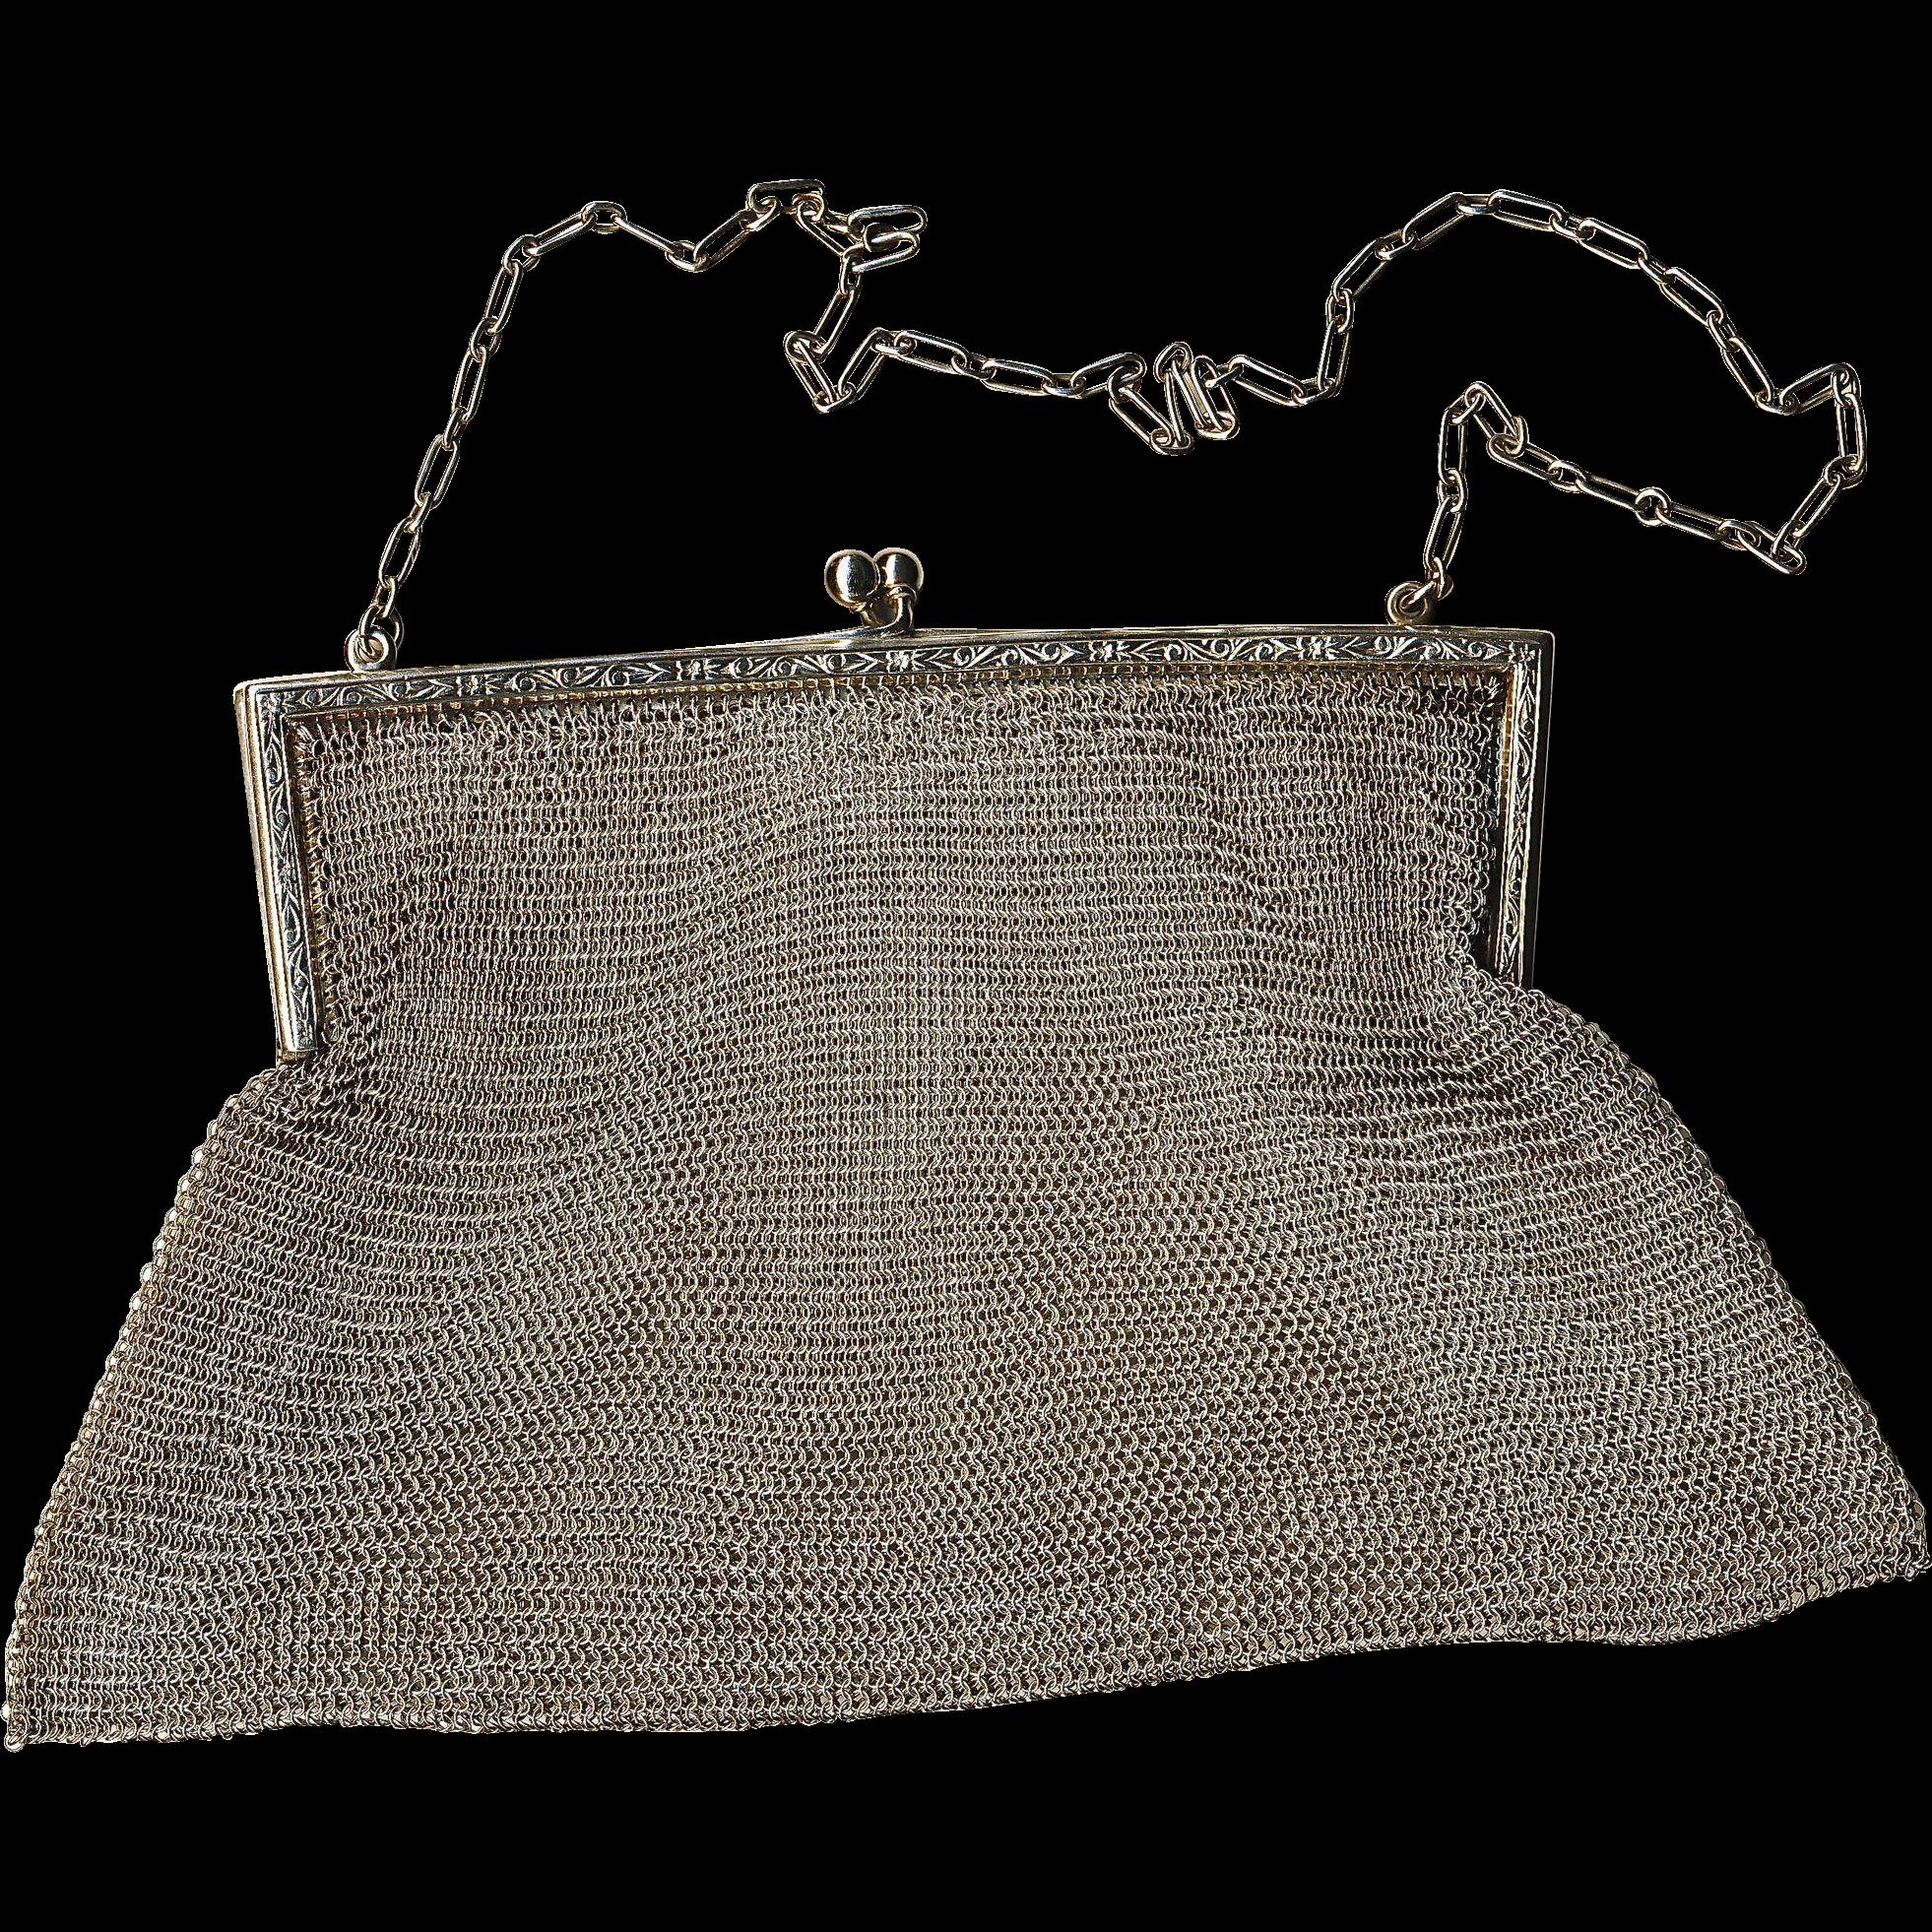 Sterling Silver Mesh Evening Bag Circa 1930's